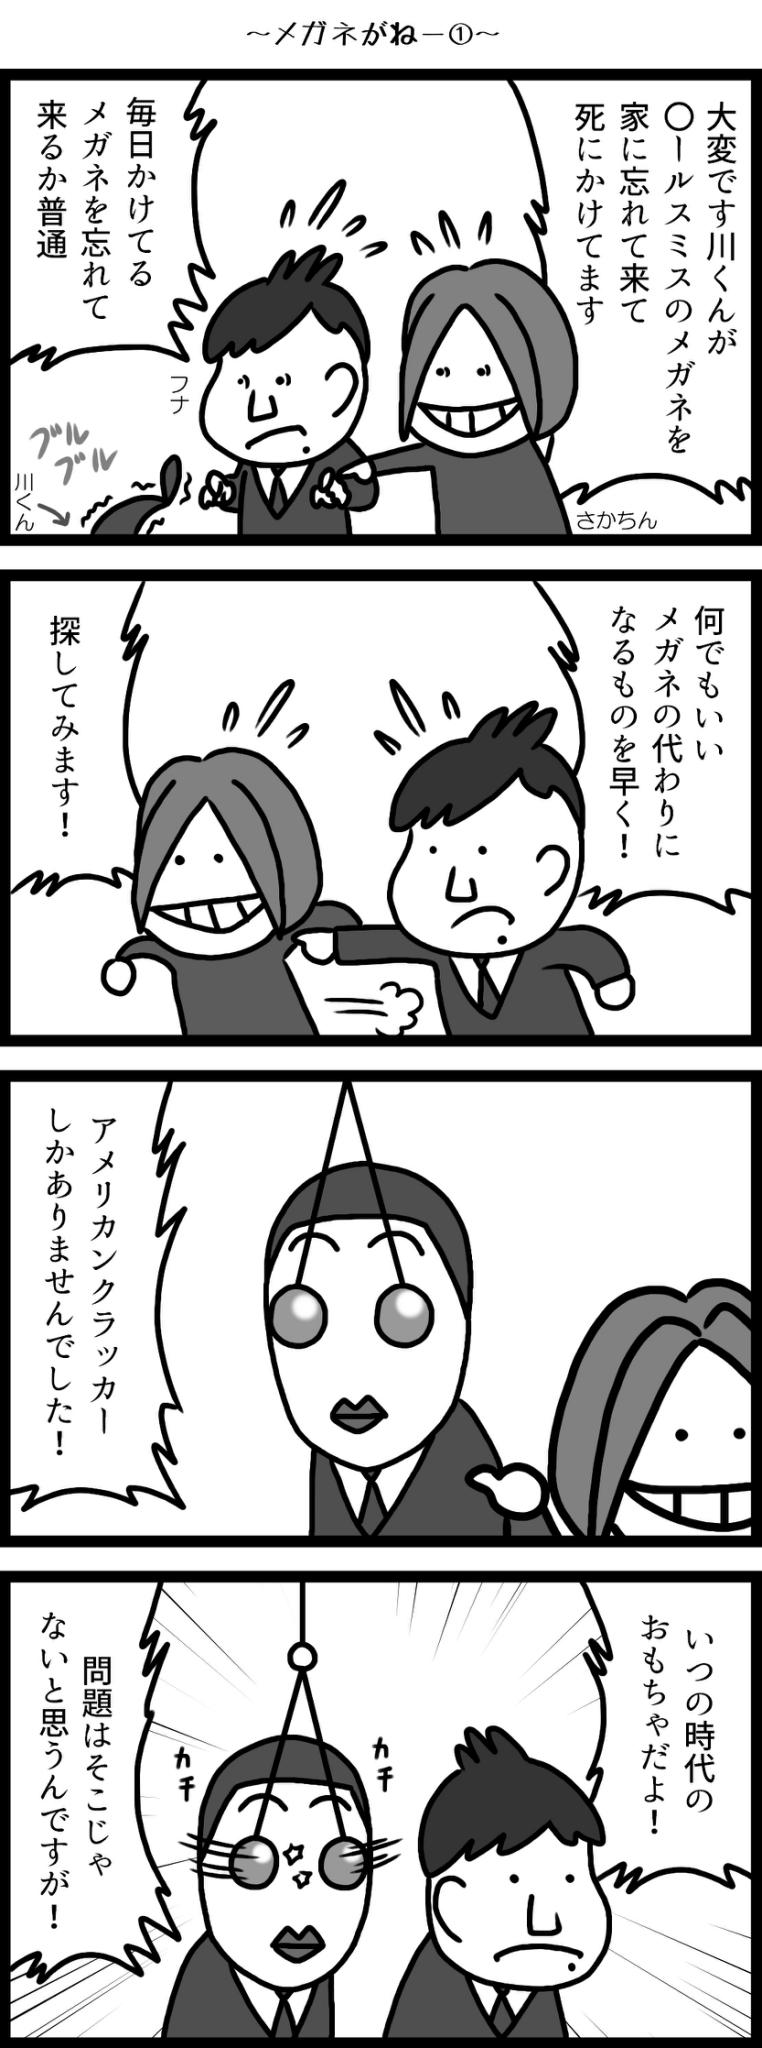 Vol.59 メガネがねー①